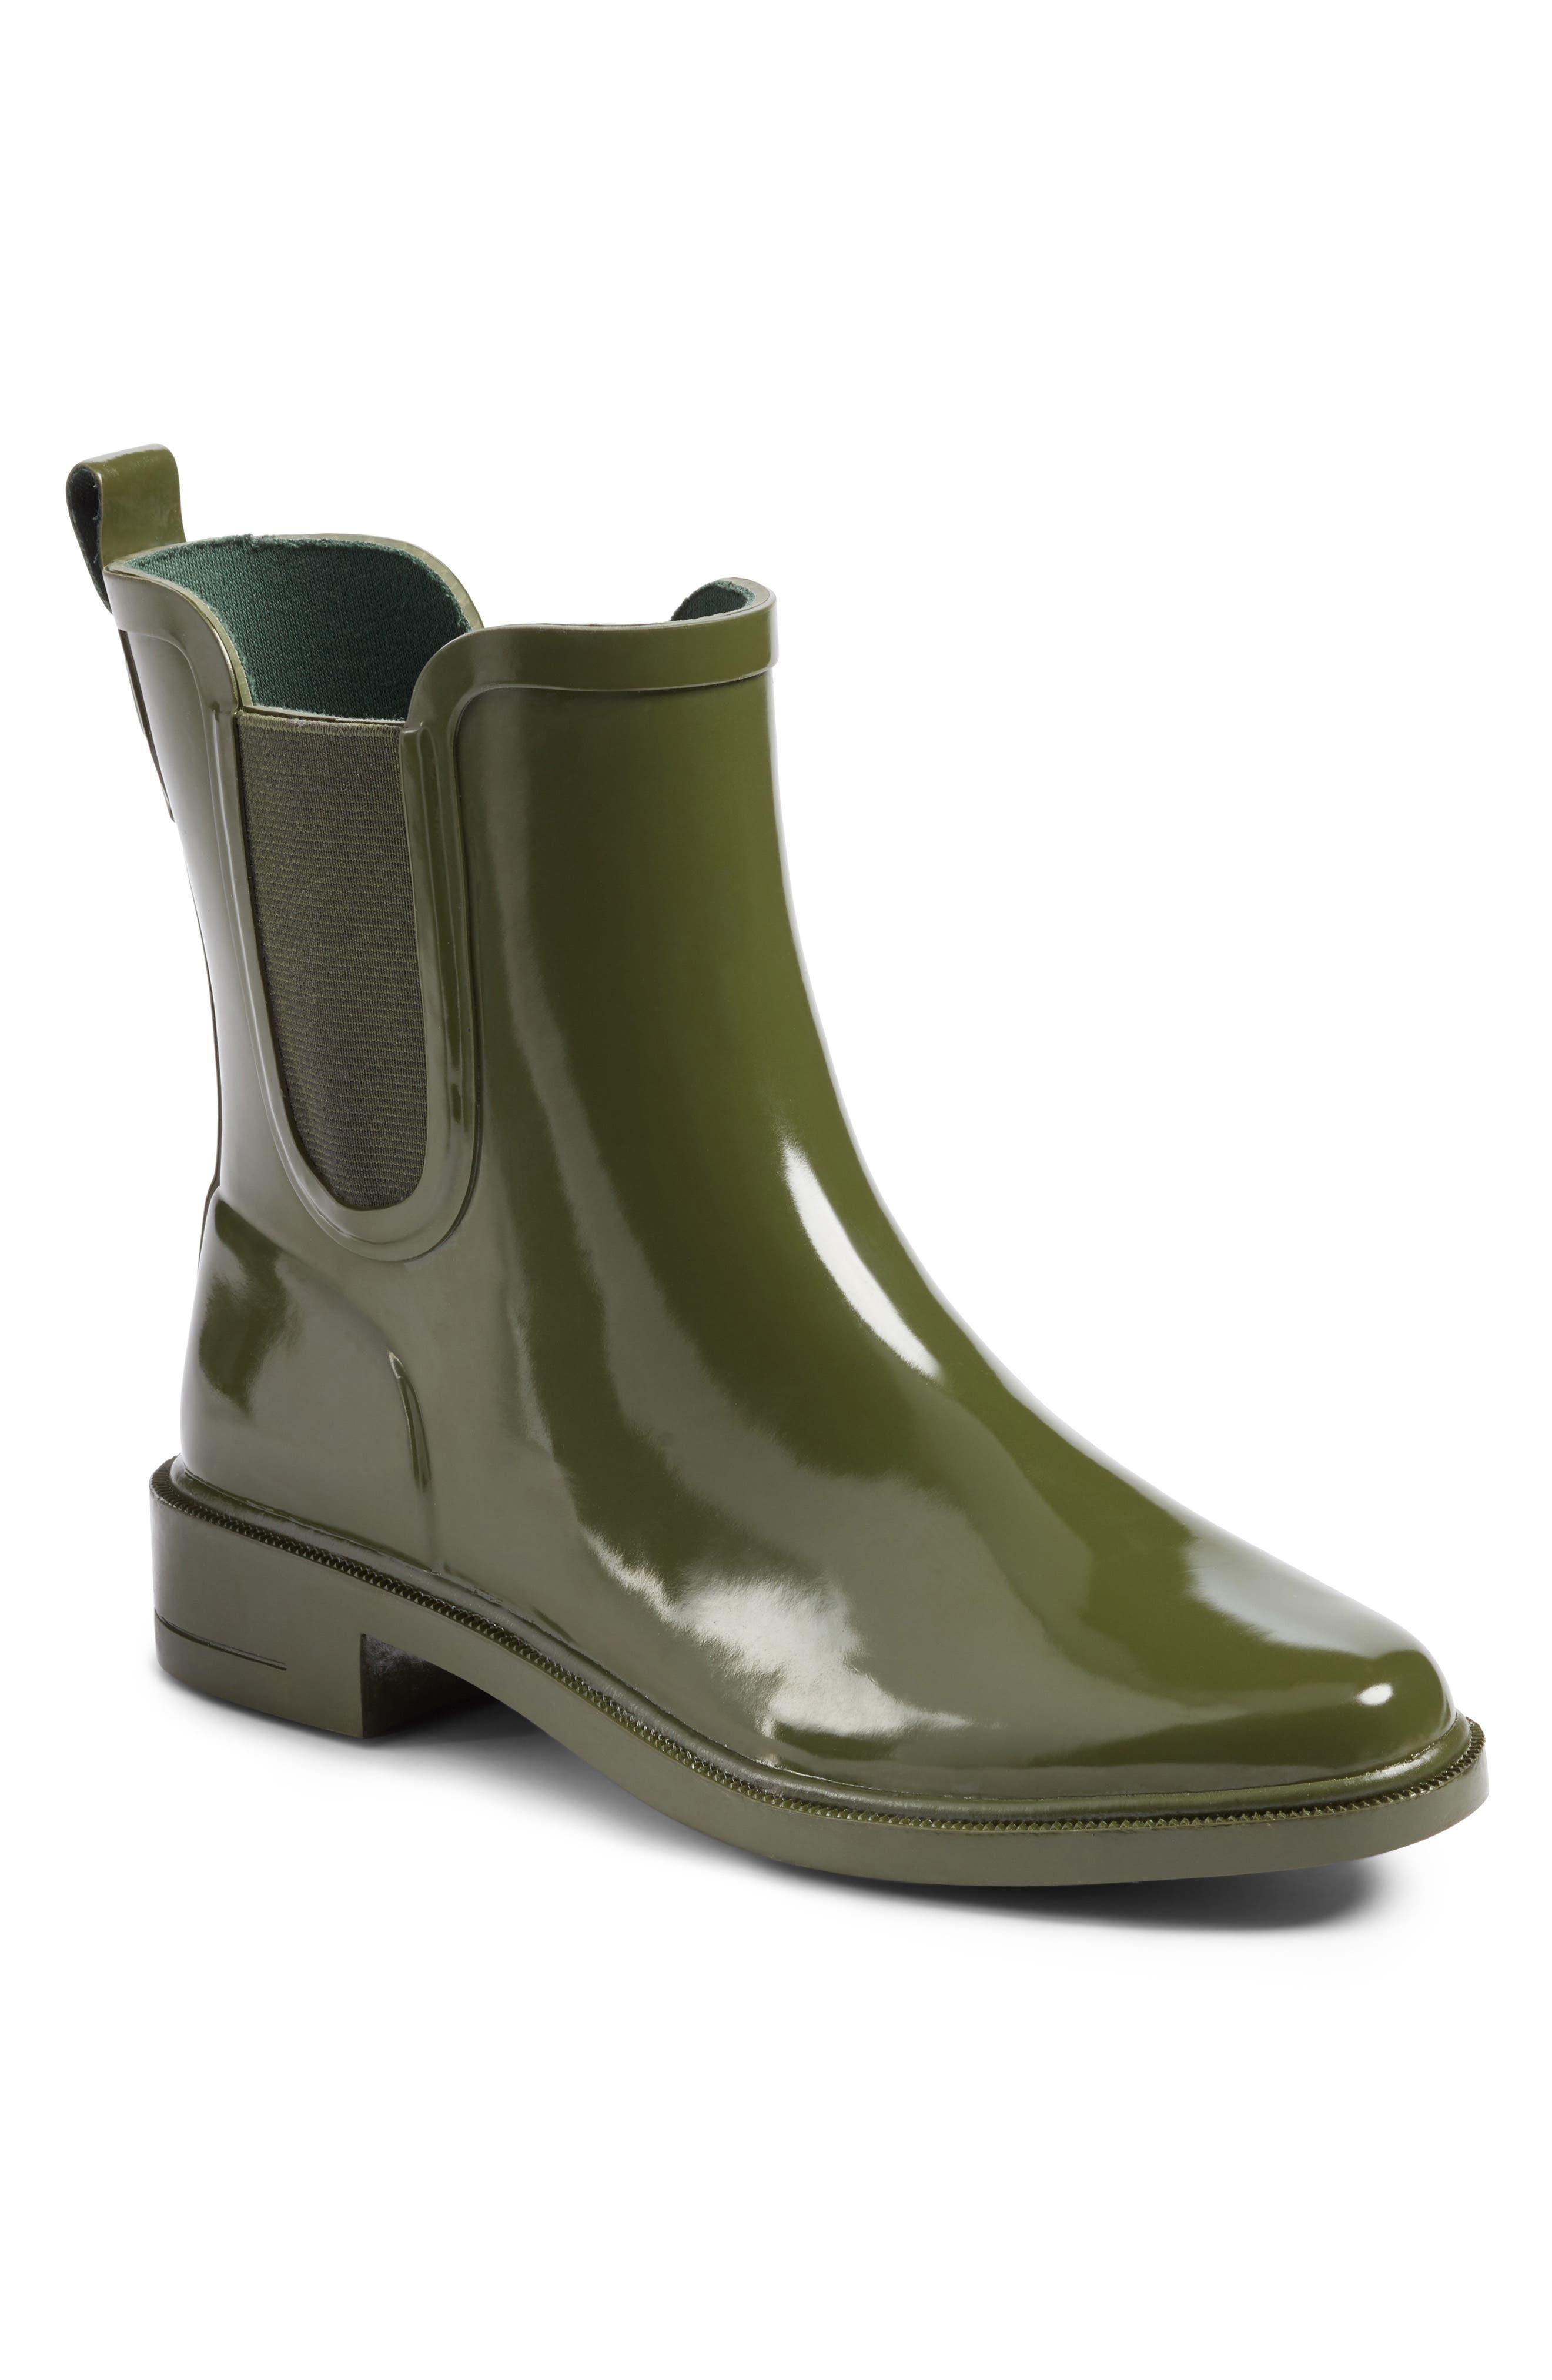 TORY BURCH Stormy Chelsea Rain Bootie